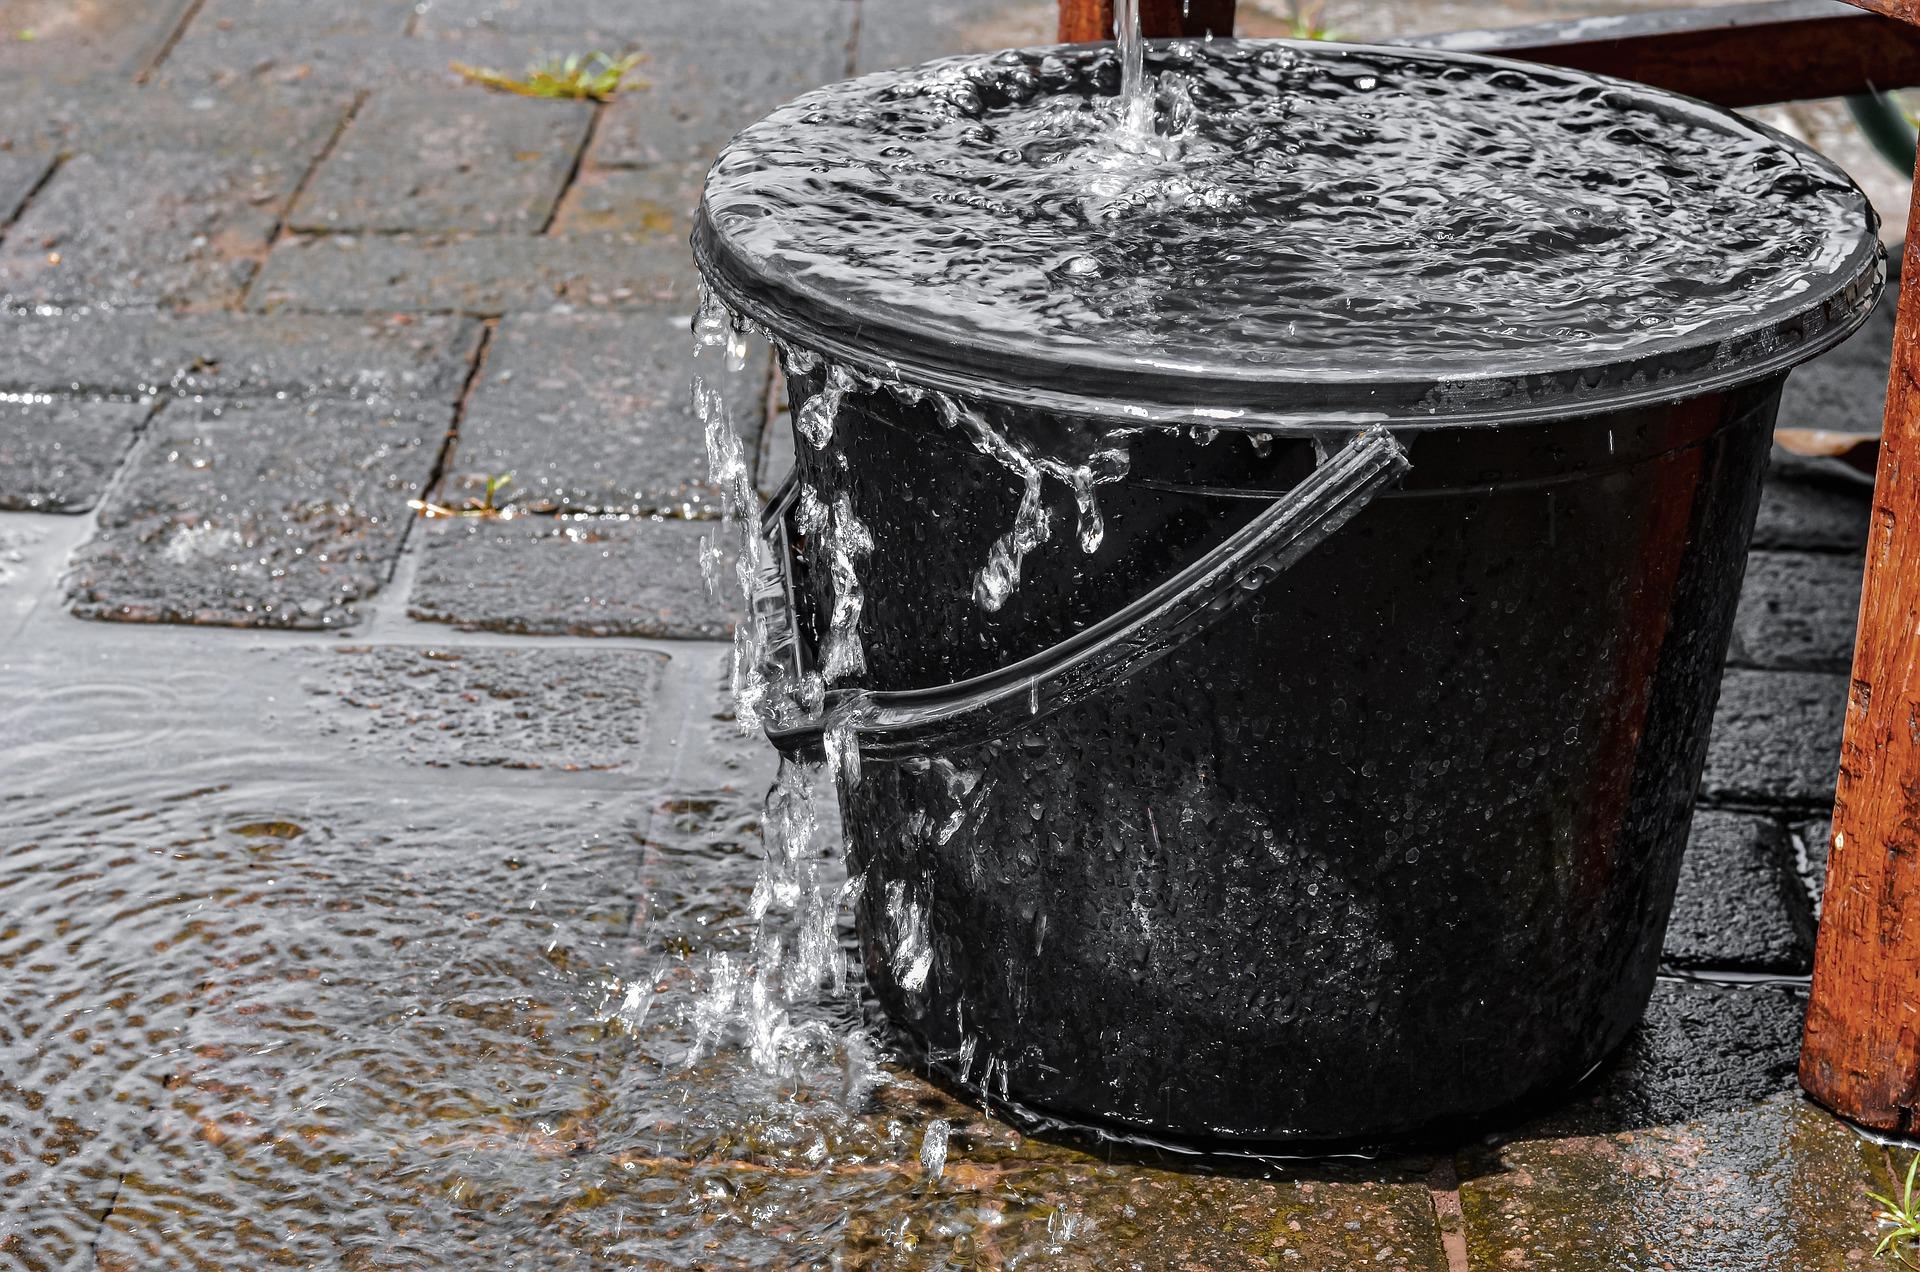 Overflowing bucket